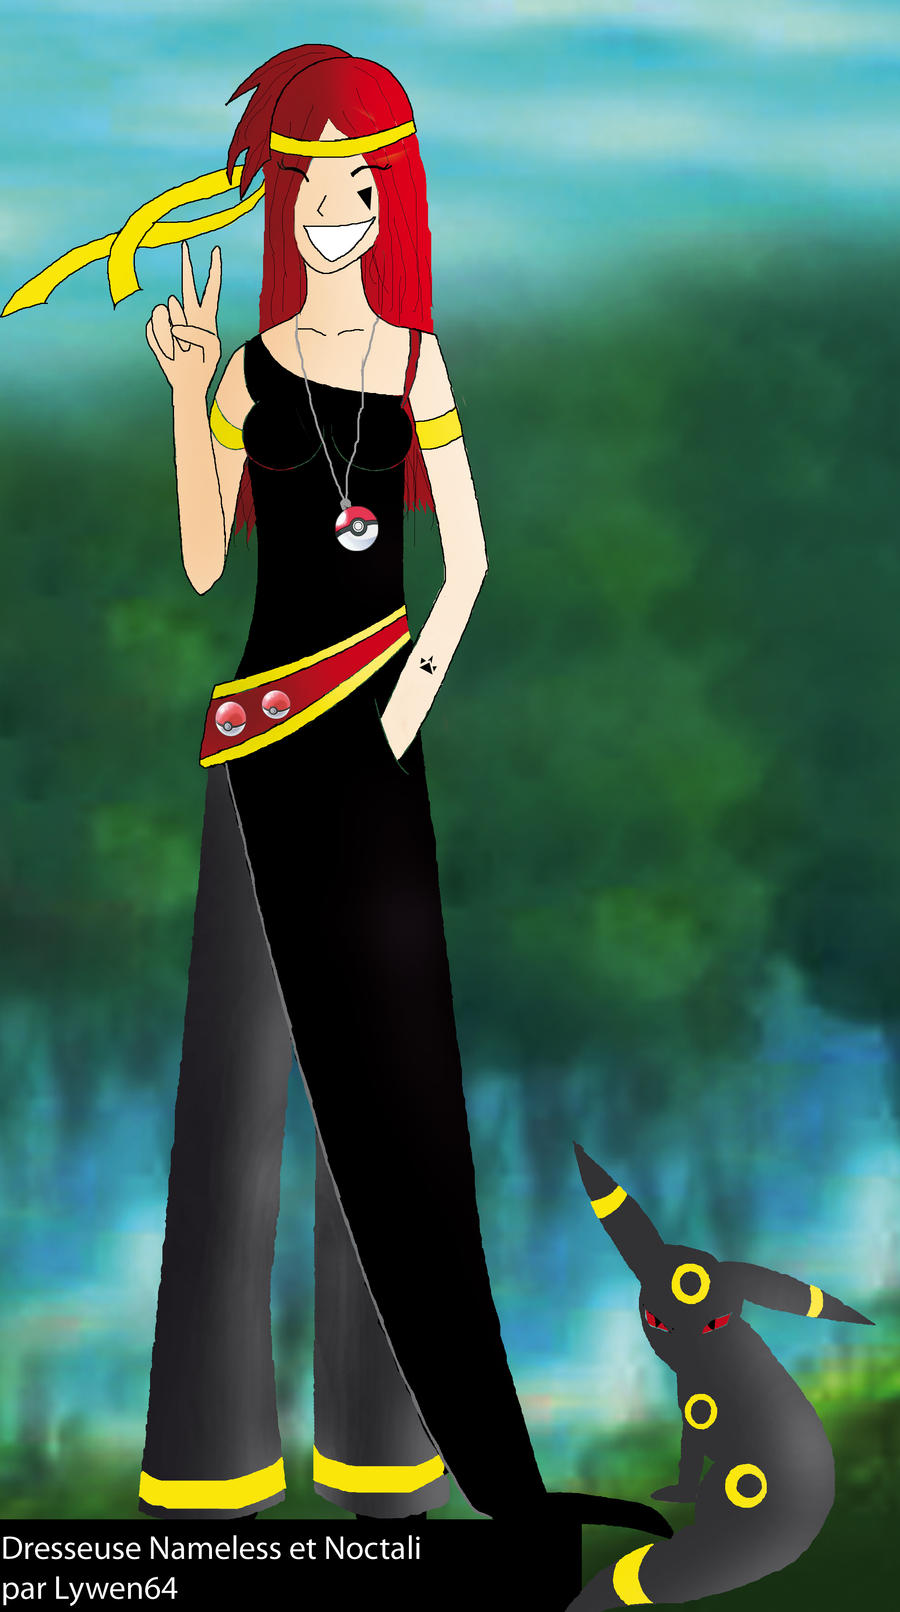 Dresseuse Pokemon Et Noctali By Lywen64 On Deviantart